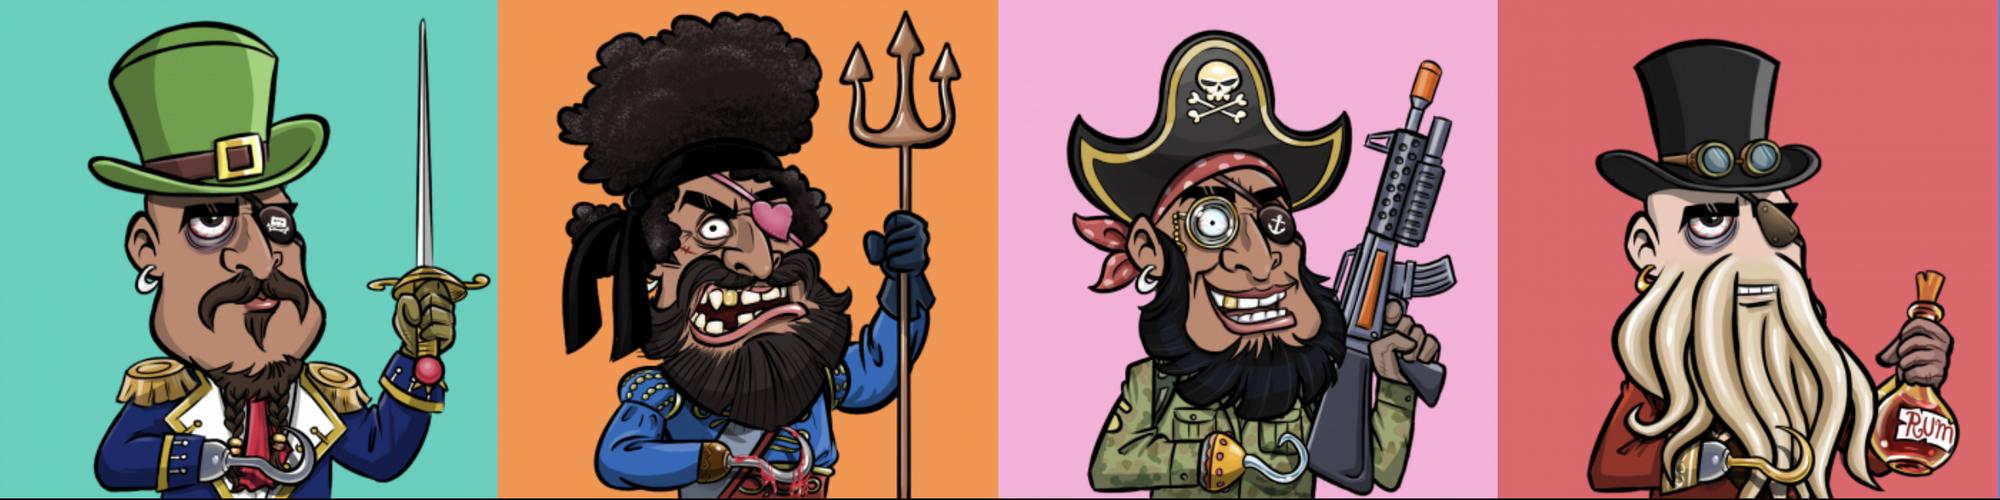 Pirate Treasure Booty Club Artwork